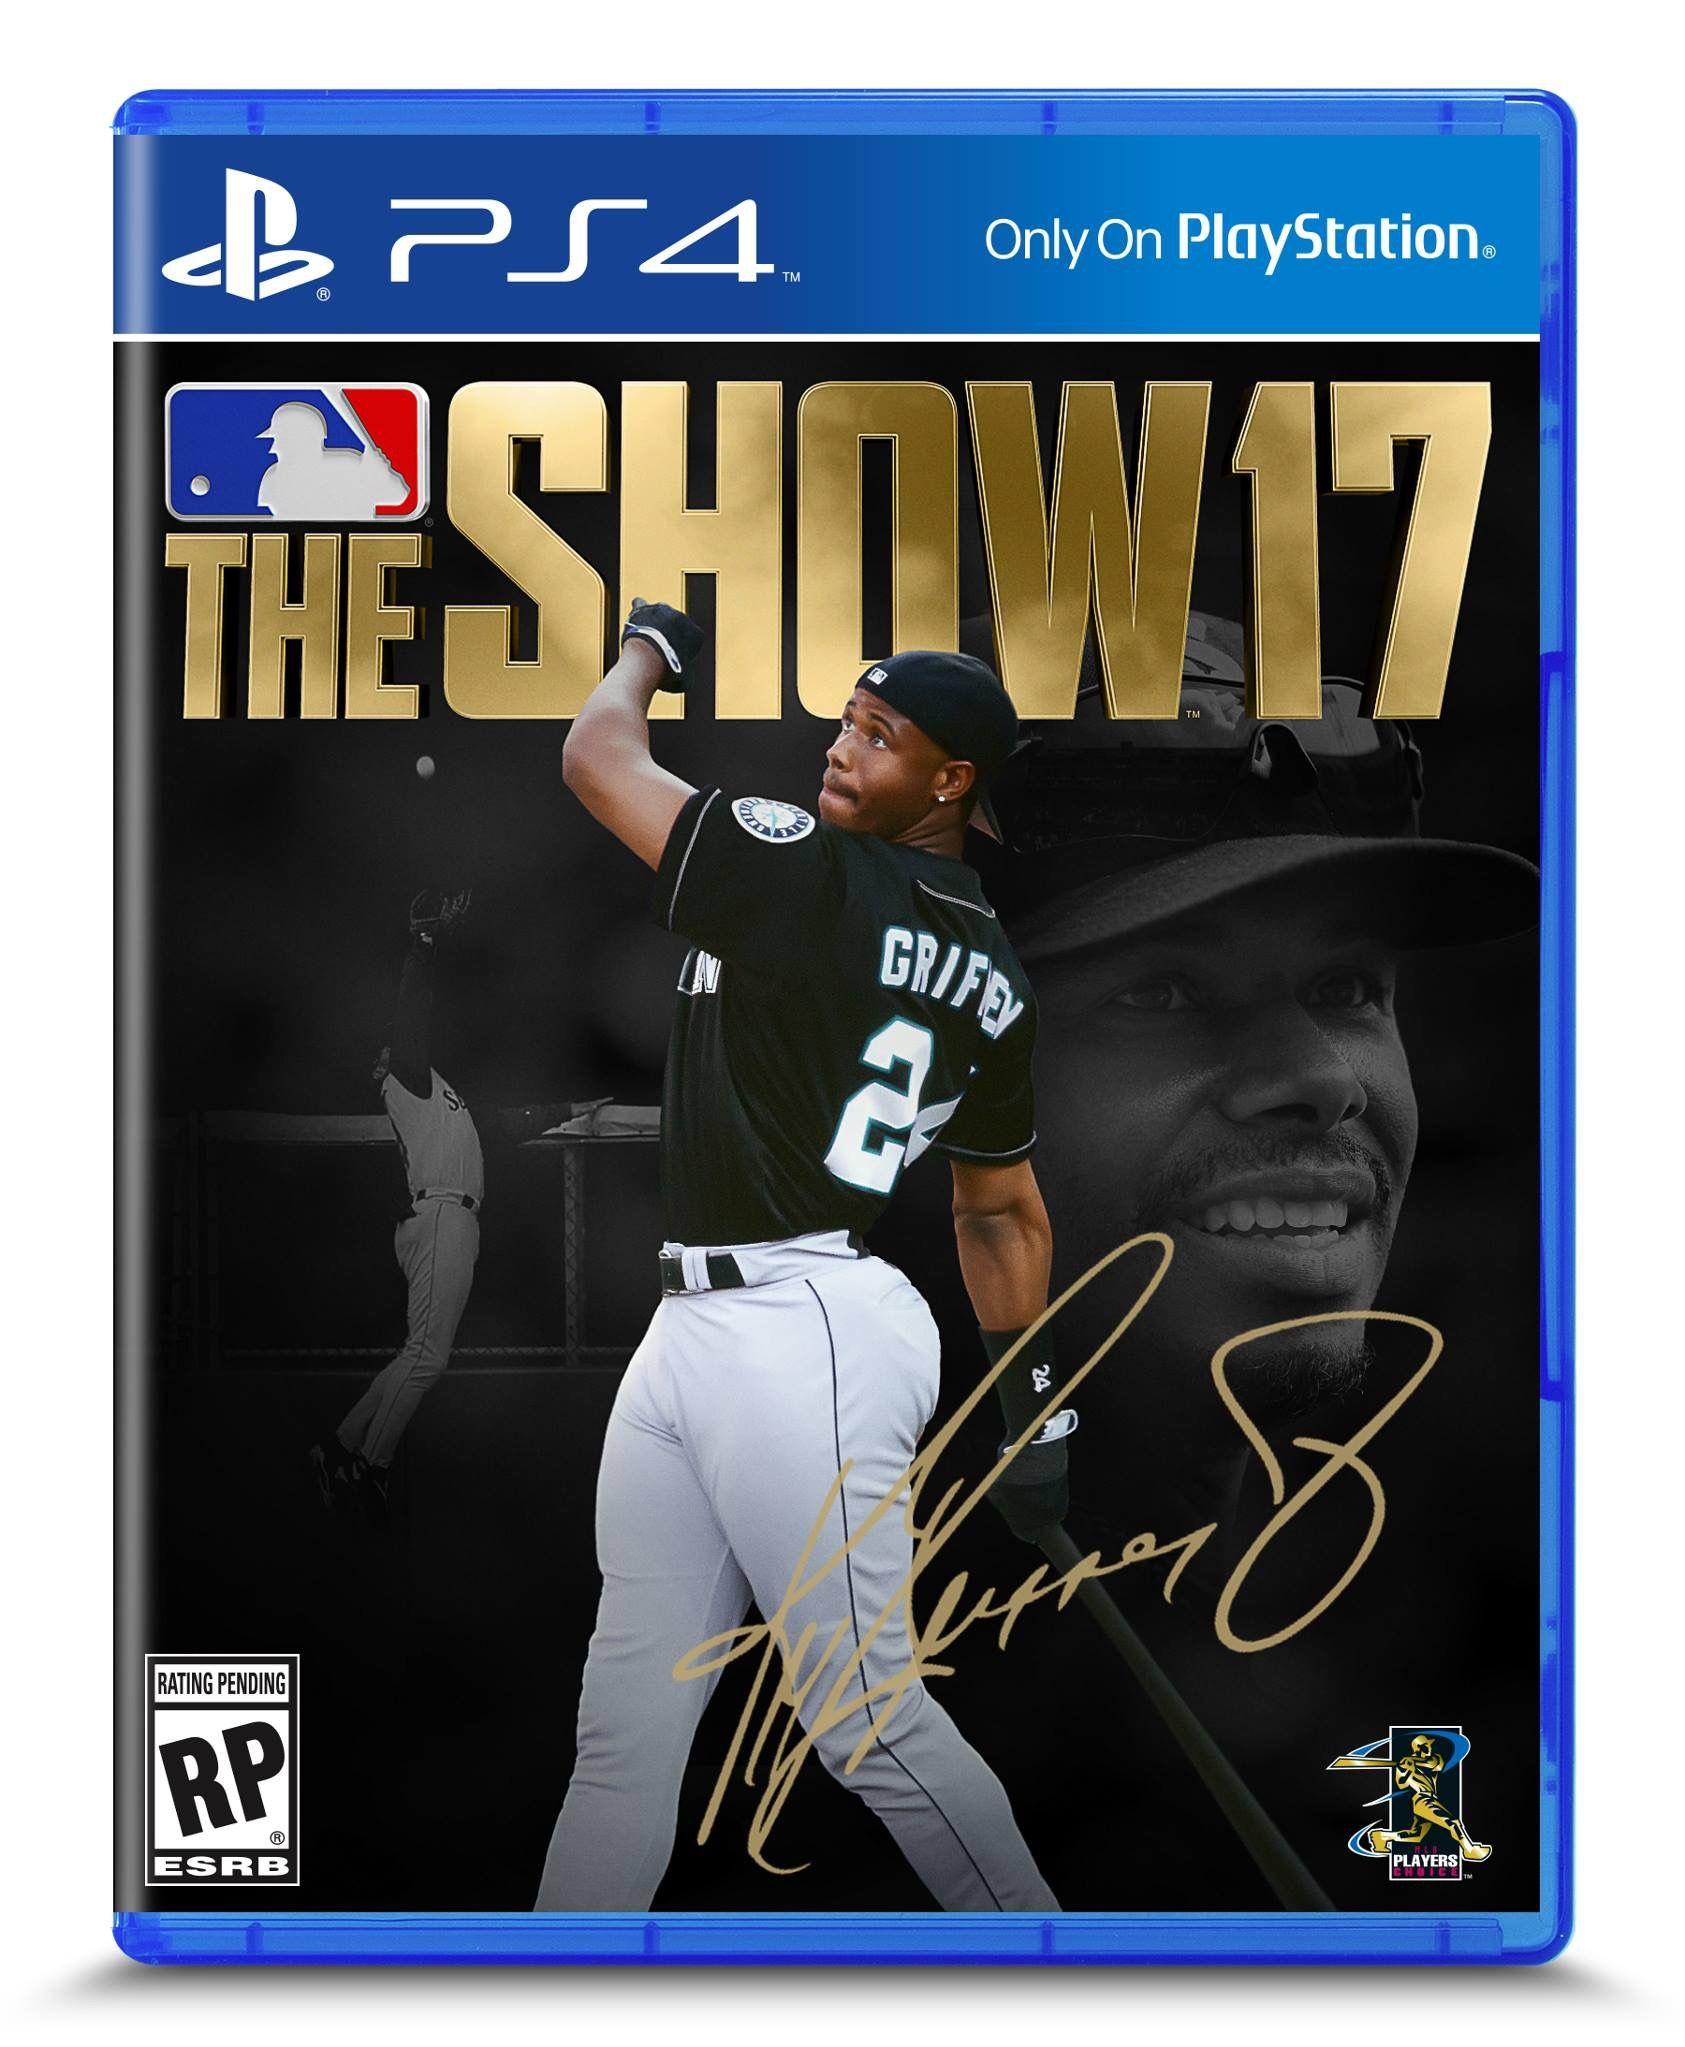 Ken Griffey Jr Mlb The Show Playstation Playstation 4